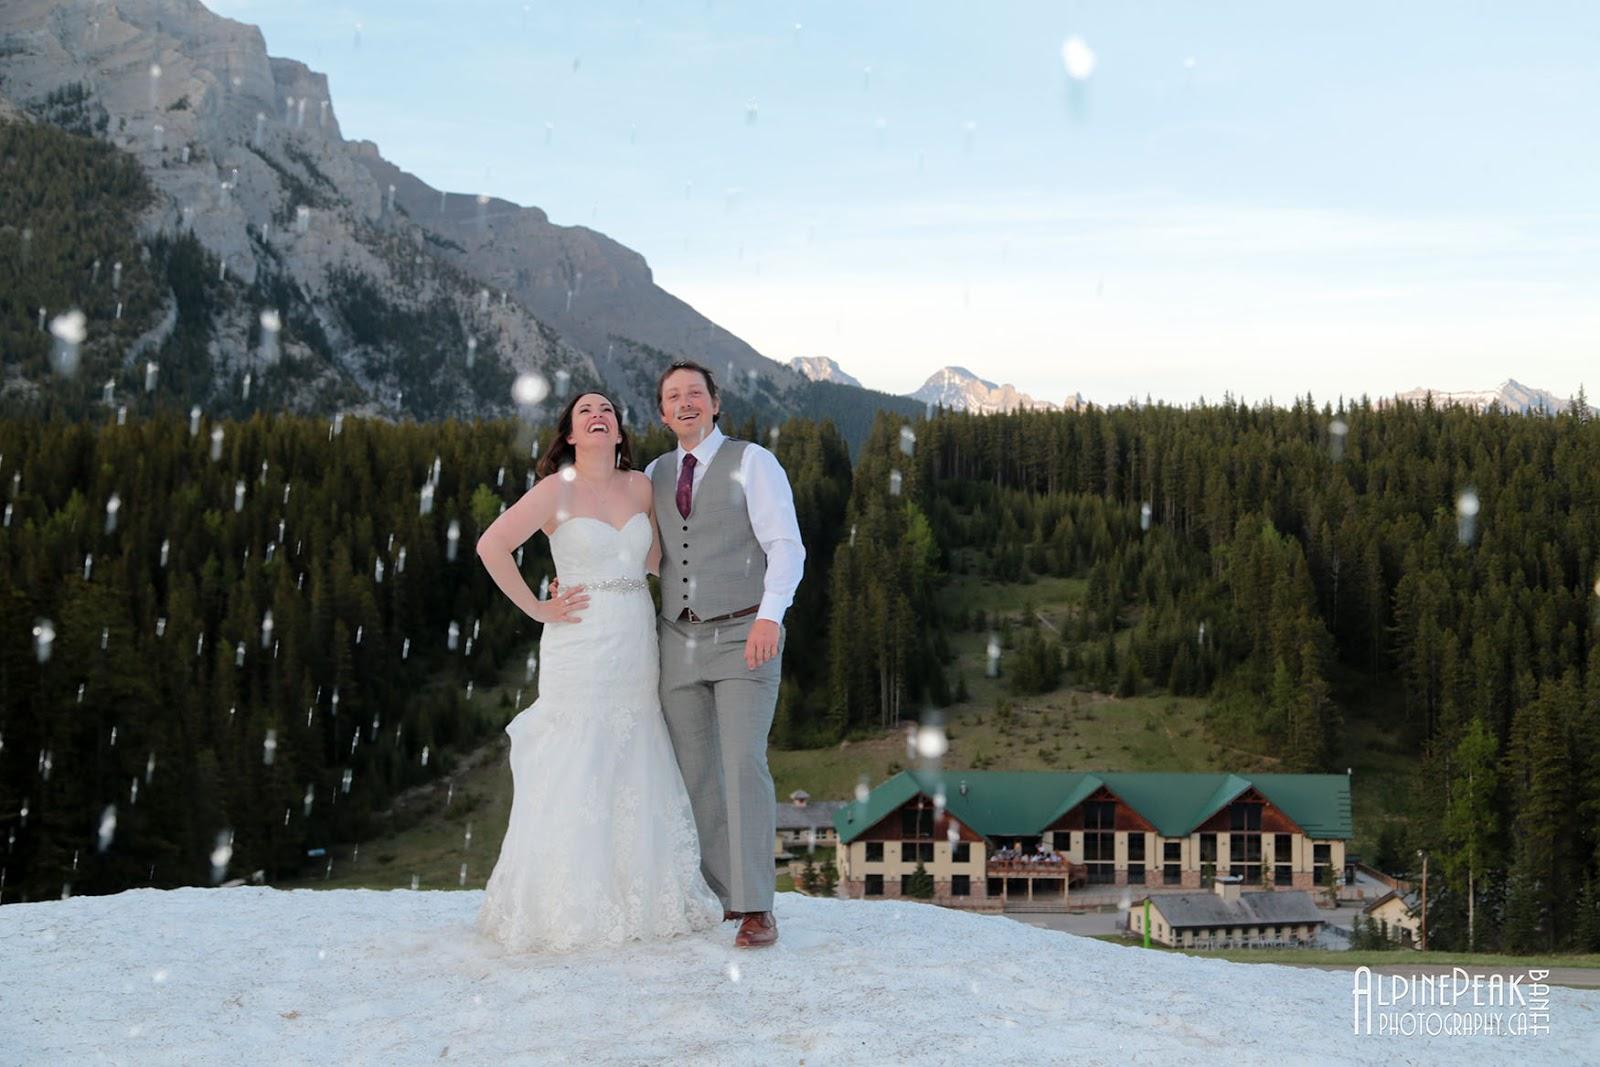 Alec Baldwin at celebrity ski | Ski resorts | Pinterest ...